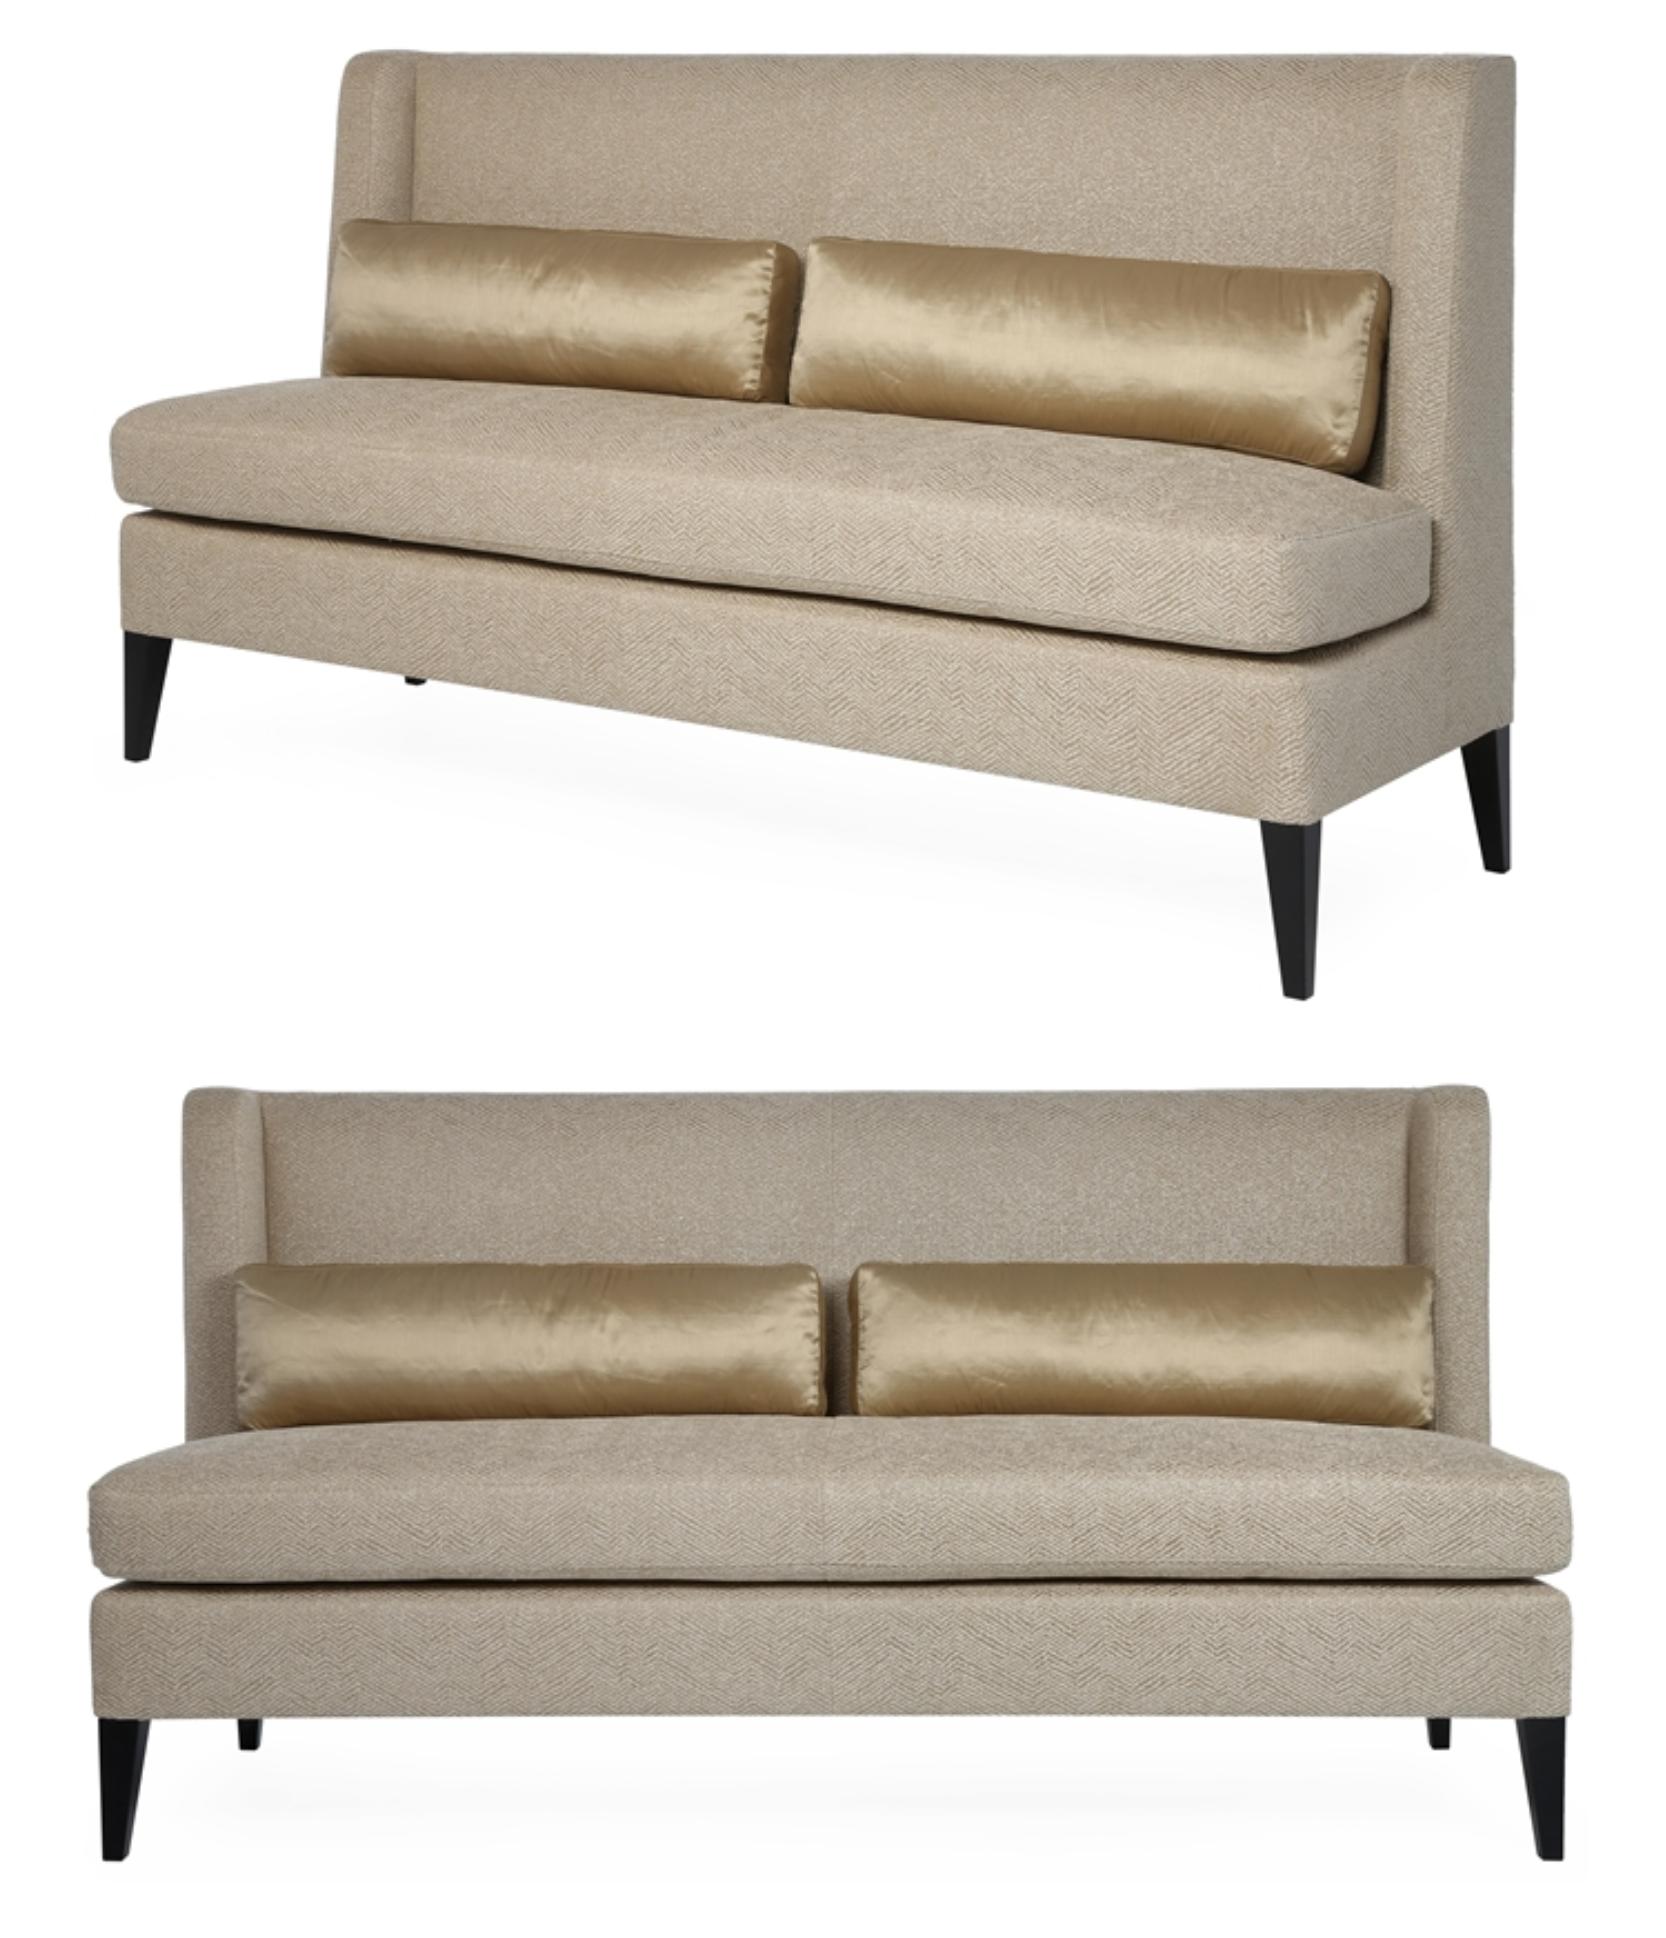 BB-BEN-M-NA-0002 - Banquet Seating - Bespoke Furniture - The Sofa ...